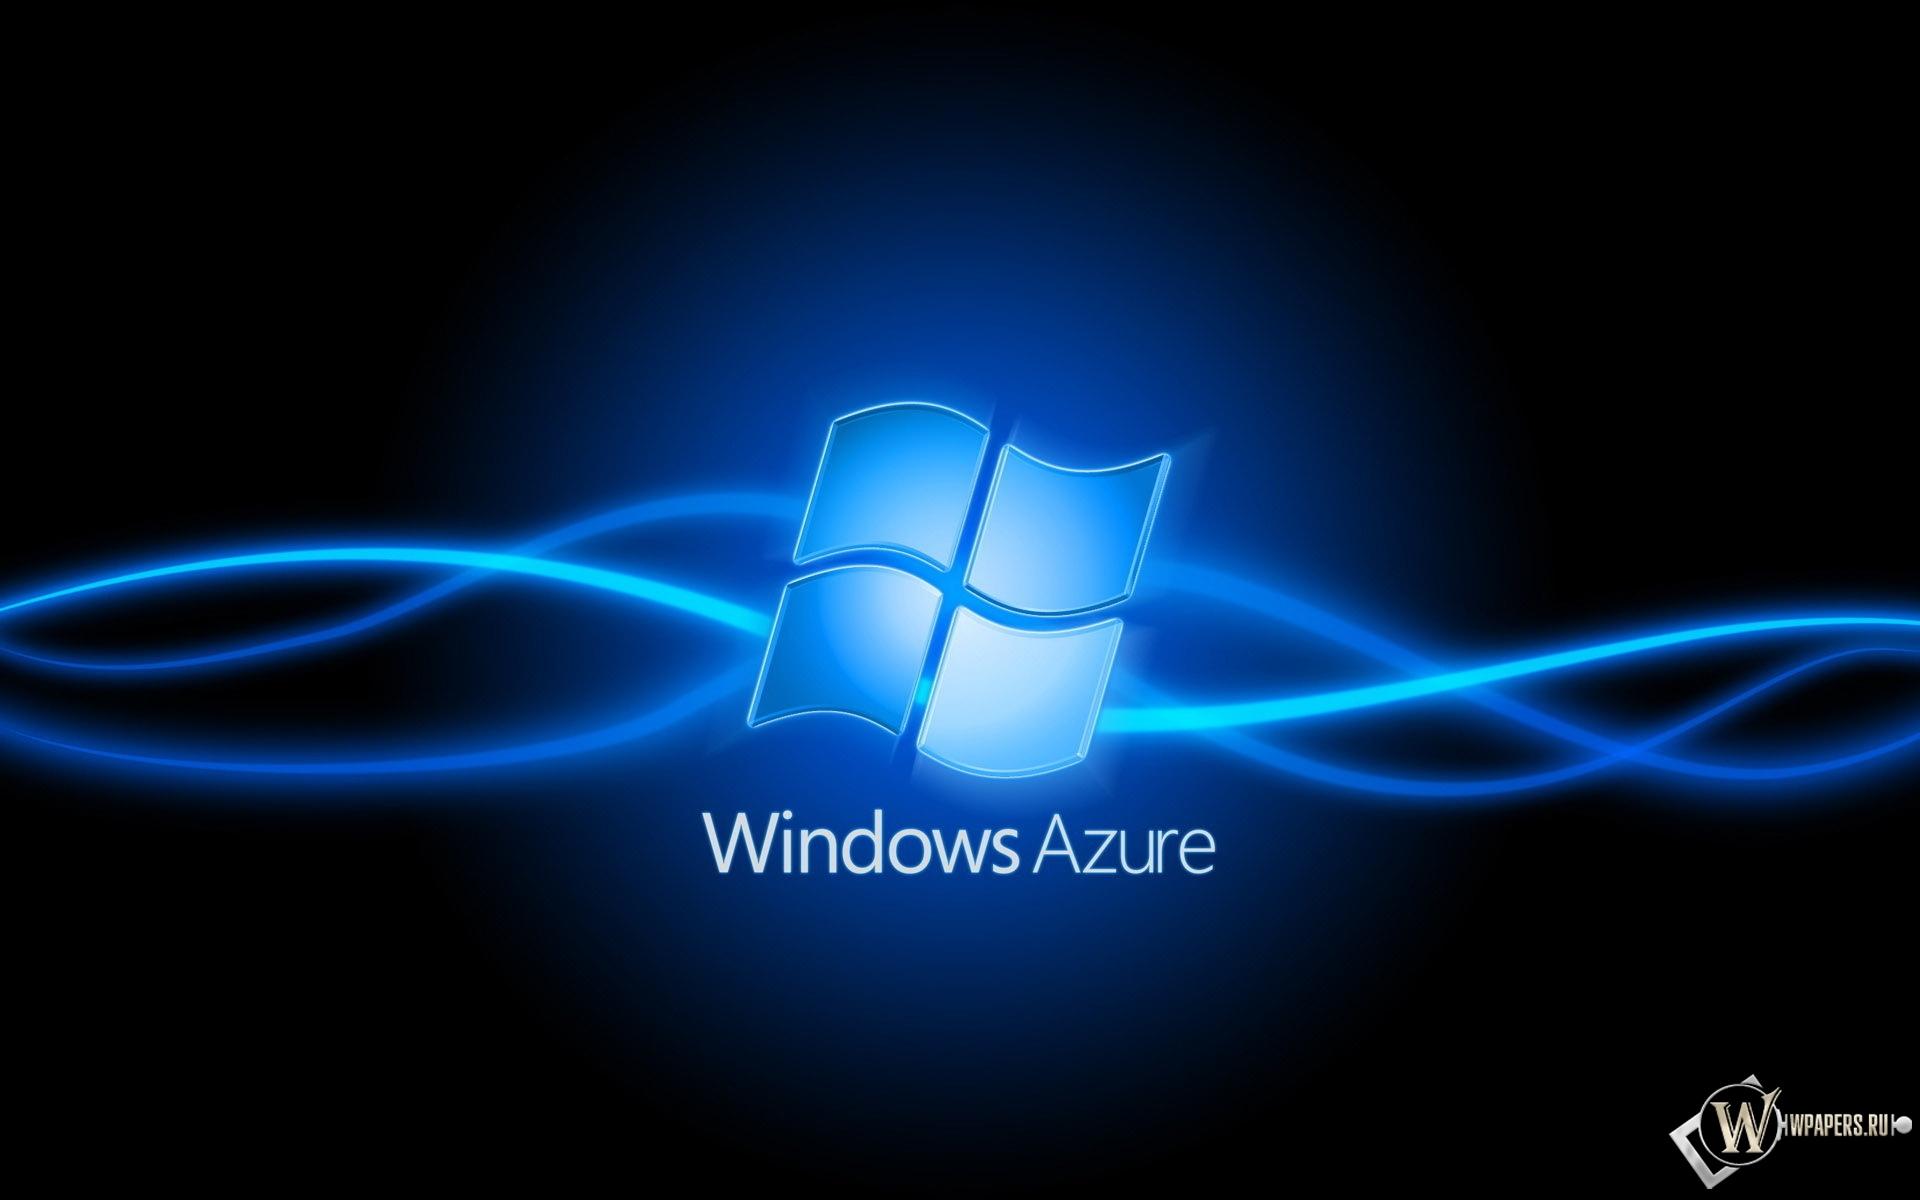 Windows Azure 1920x1200